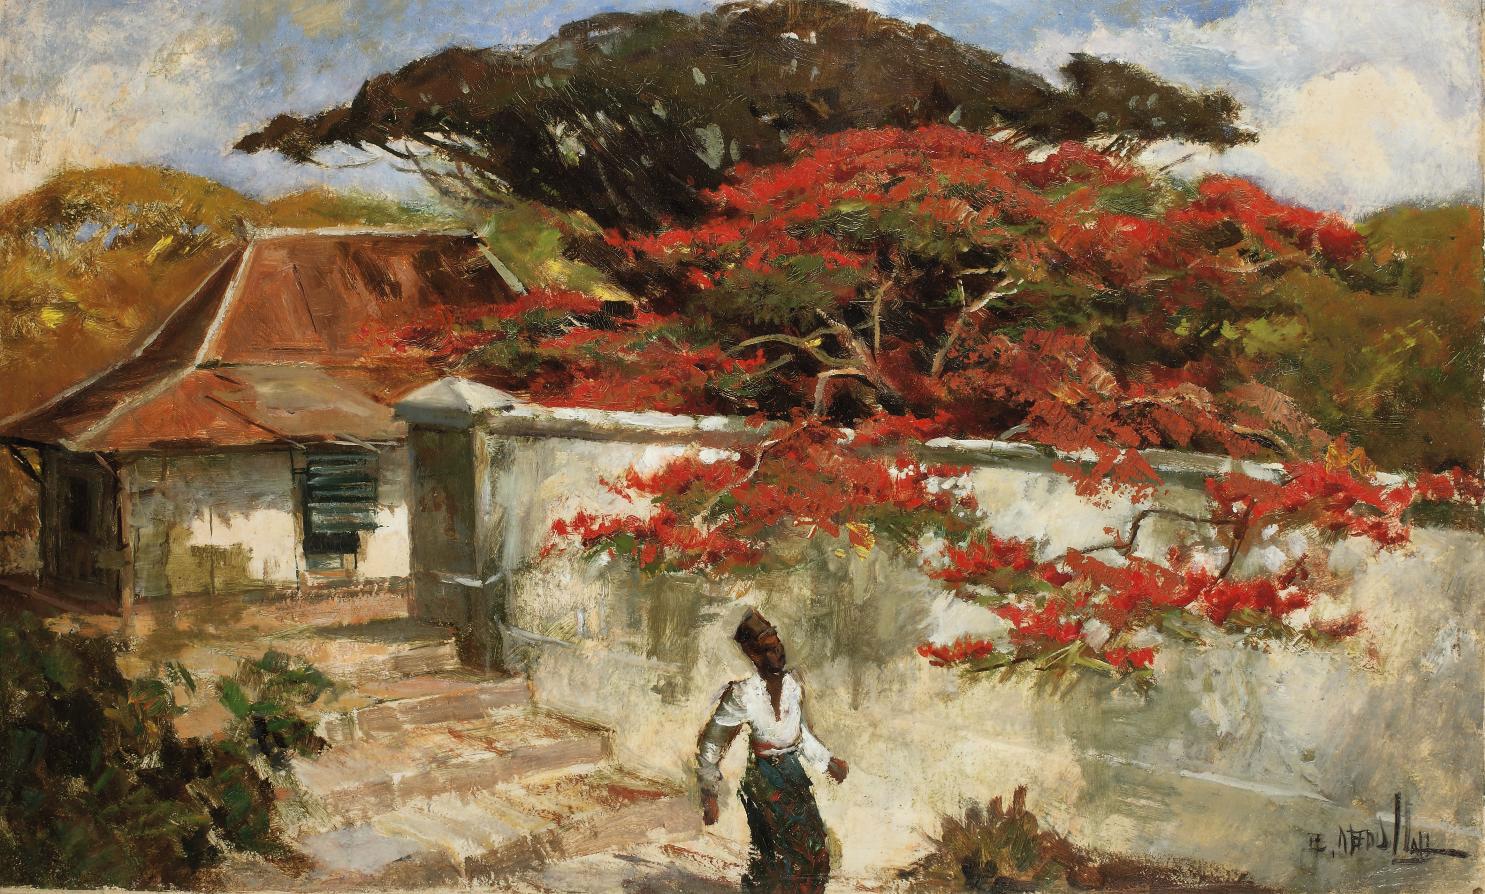 A man under a flamboyant tree